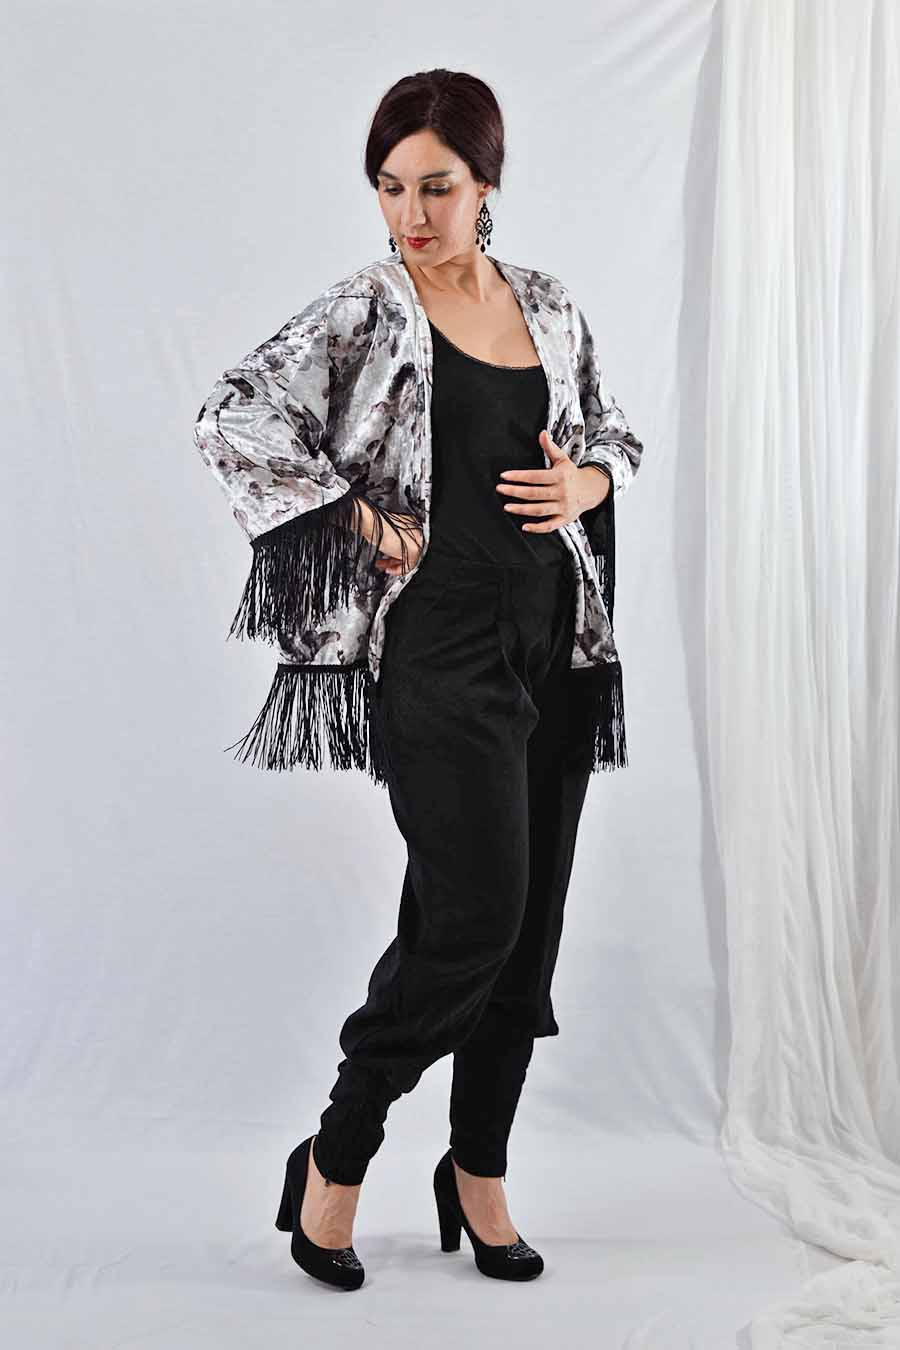 Velvet Kimono jacket with fringes in silver